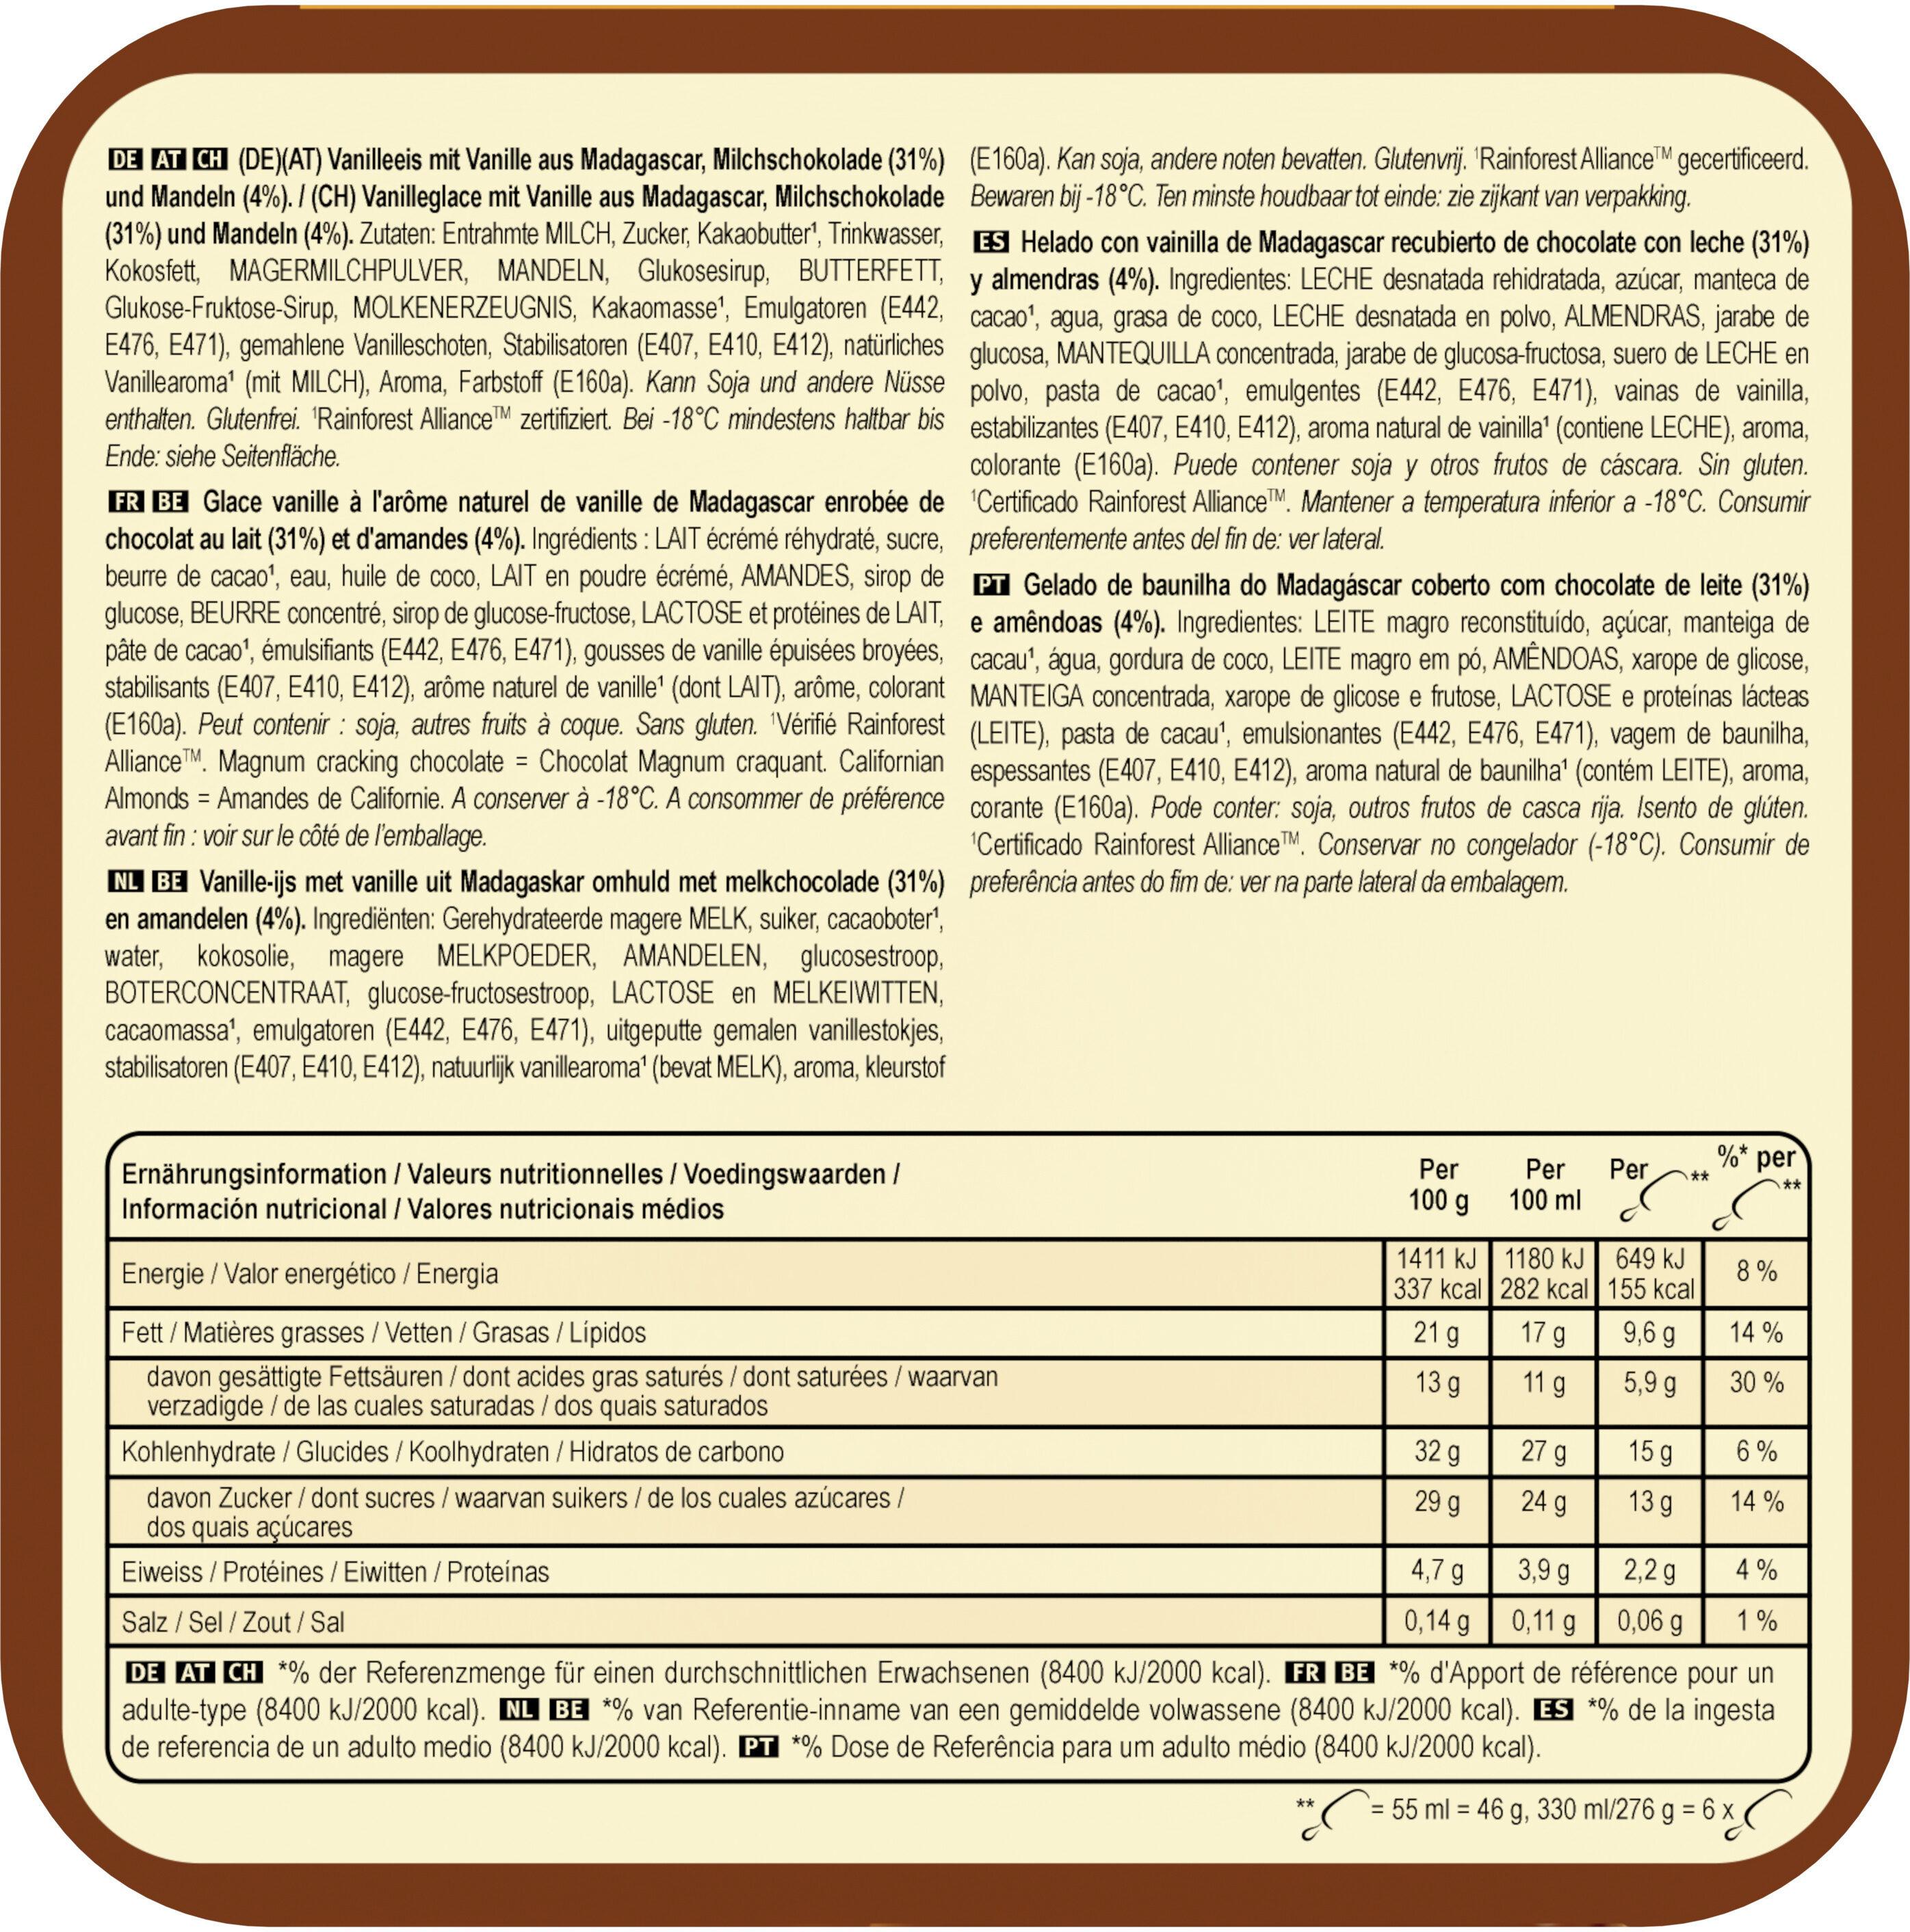 Batonnet Glace Amande x 6 330 ml - Voedingswaarden - fr